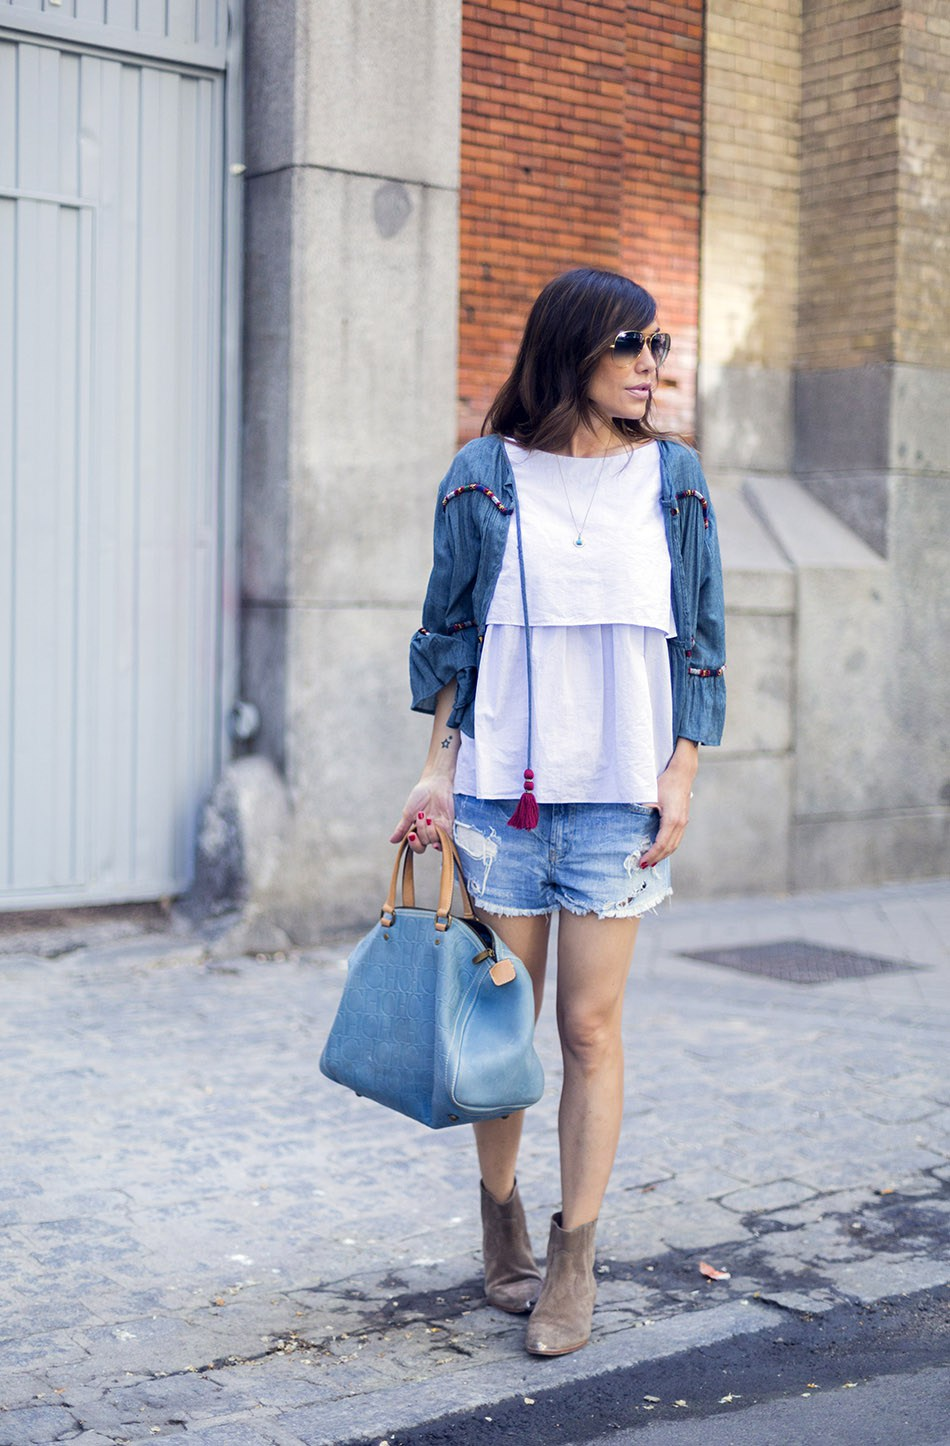 street style june 2016 outfits review bárbara crespo 01